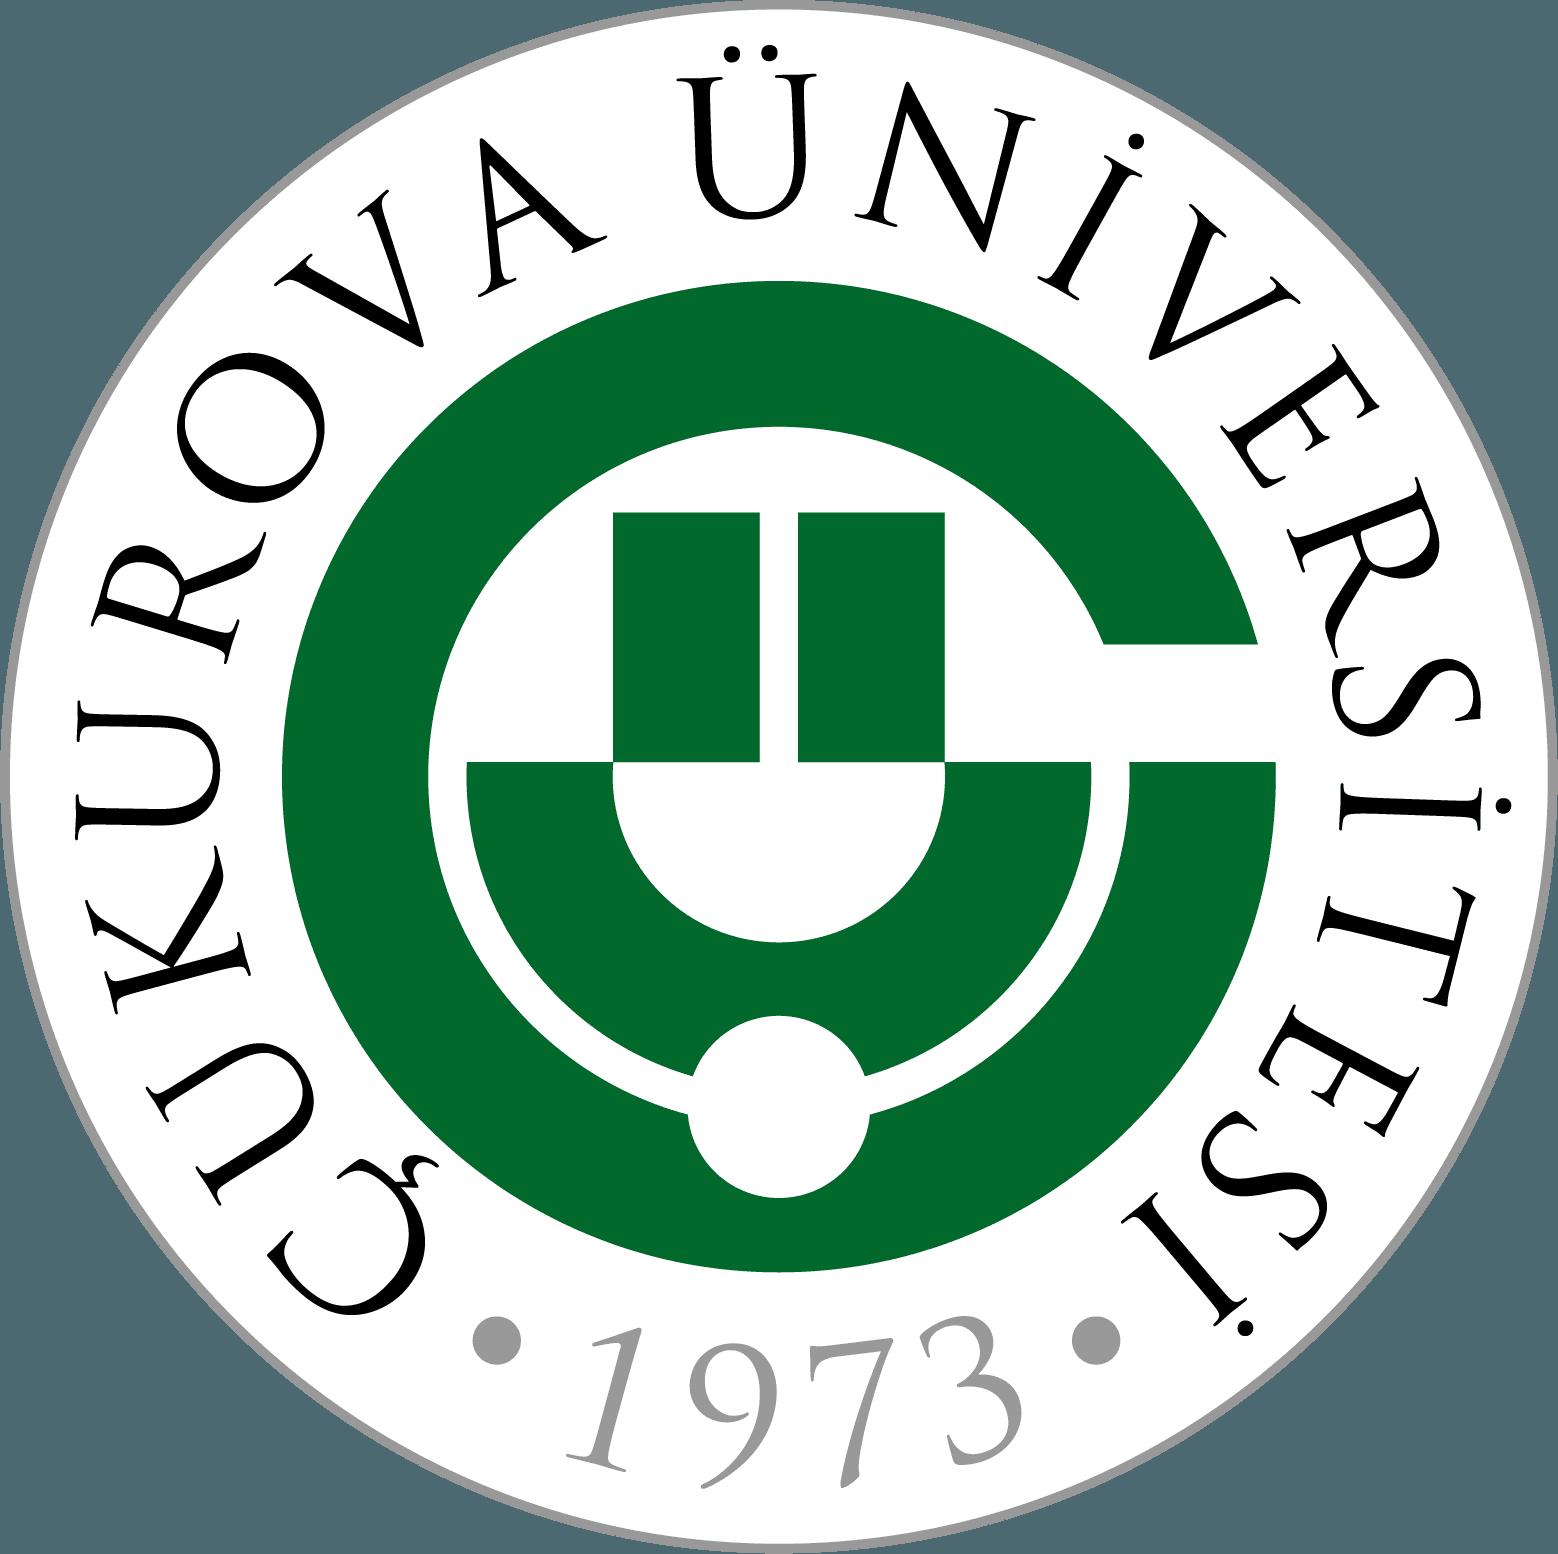 Çukurova Üniversitesi Logo   Arma png